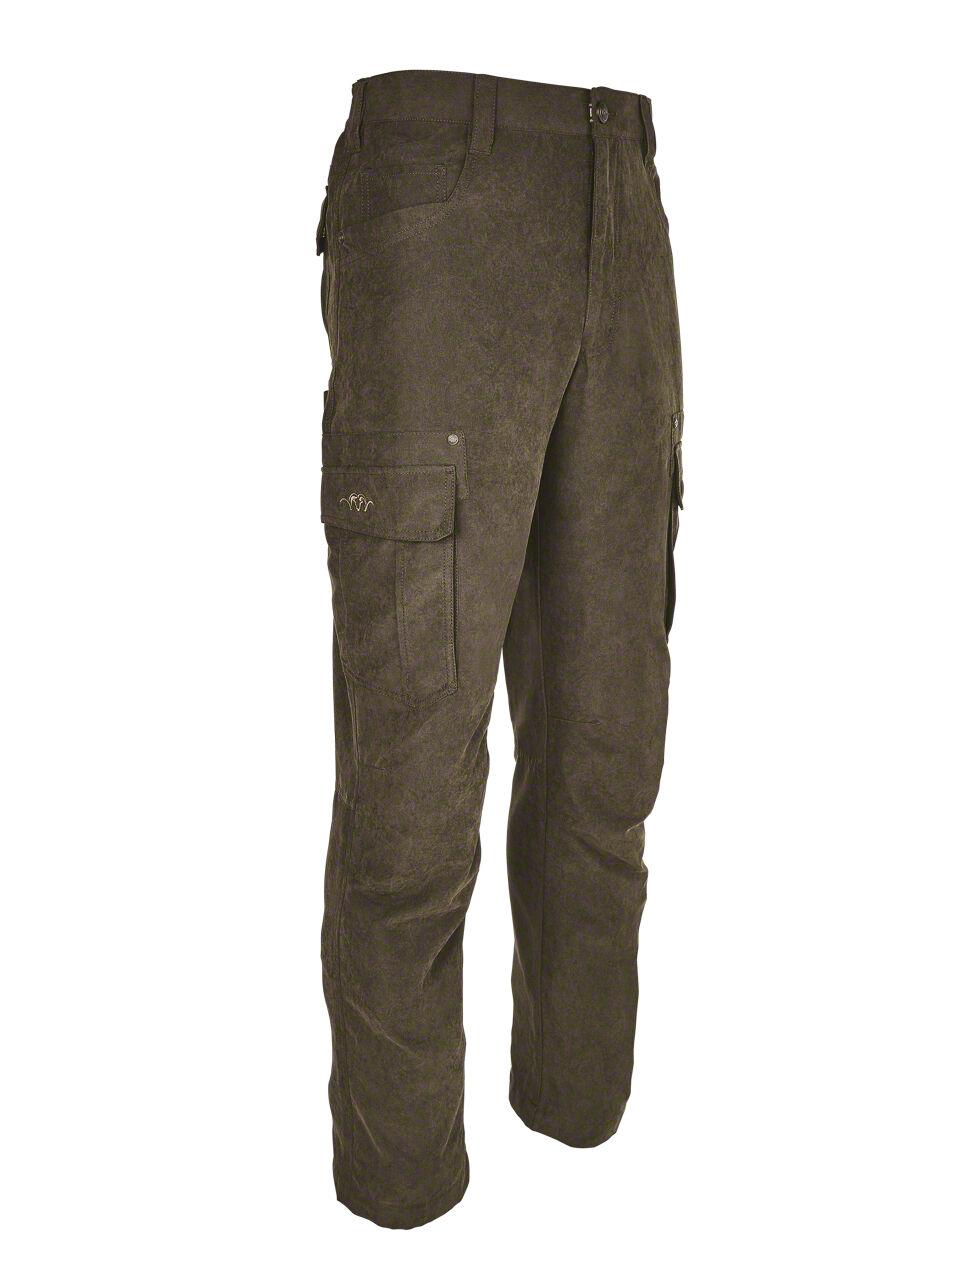 Blaser Hunting Trousers Argali ² Sportive Proxi -  Brown Melange - 117035-001  beautiful